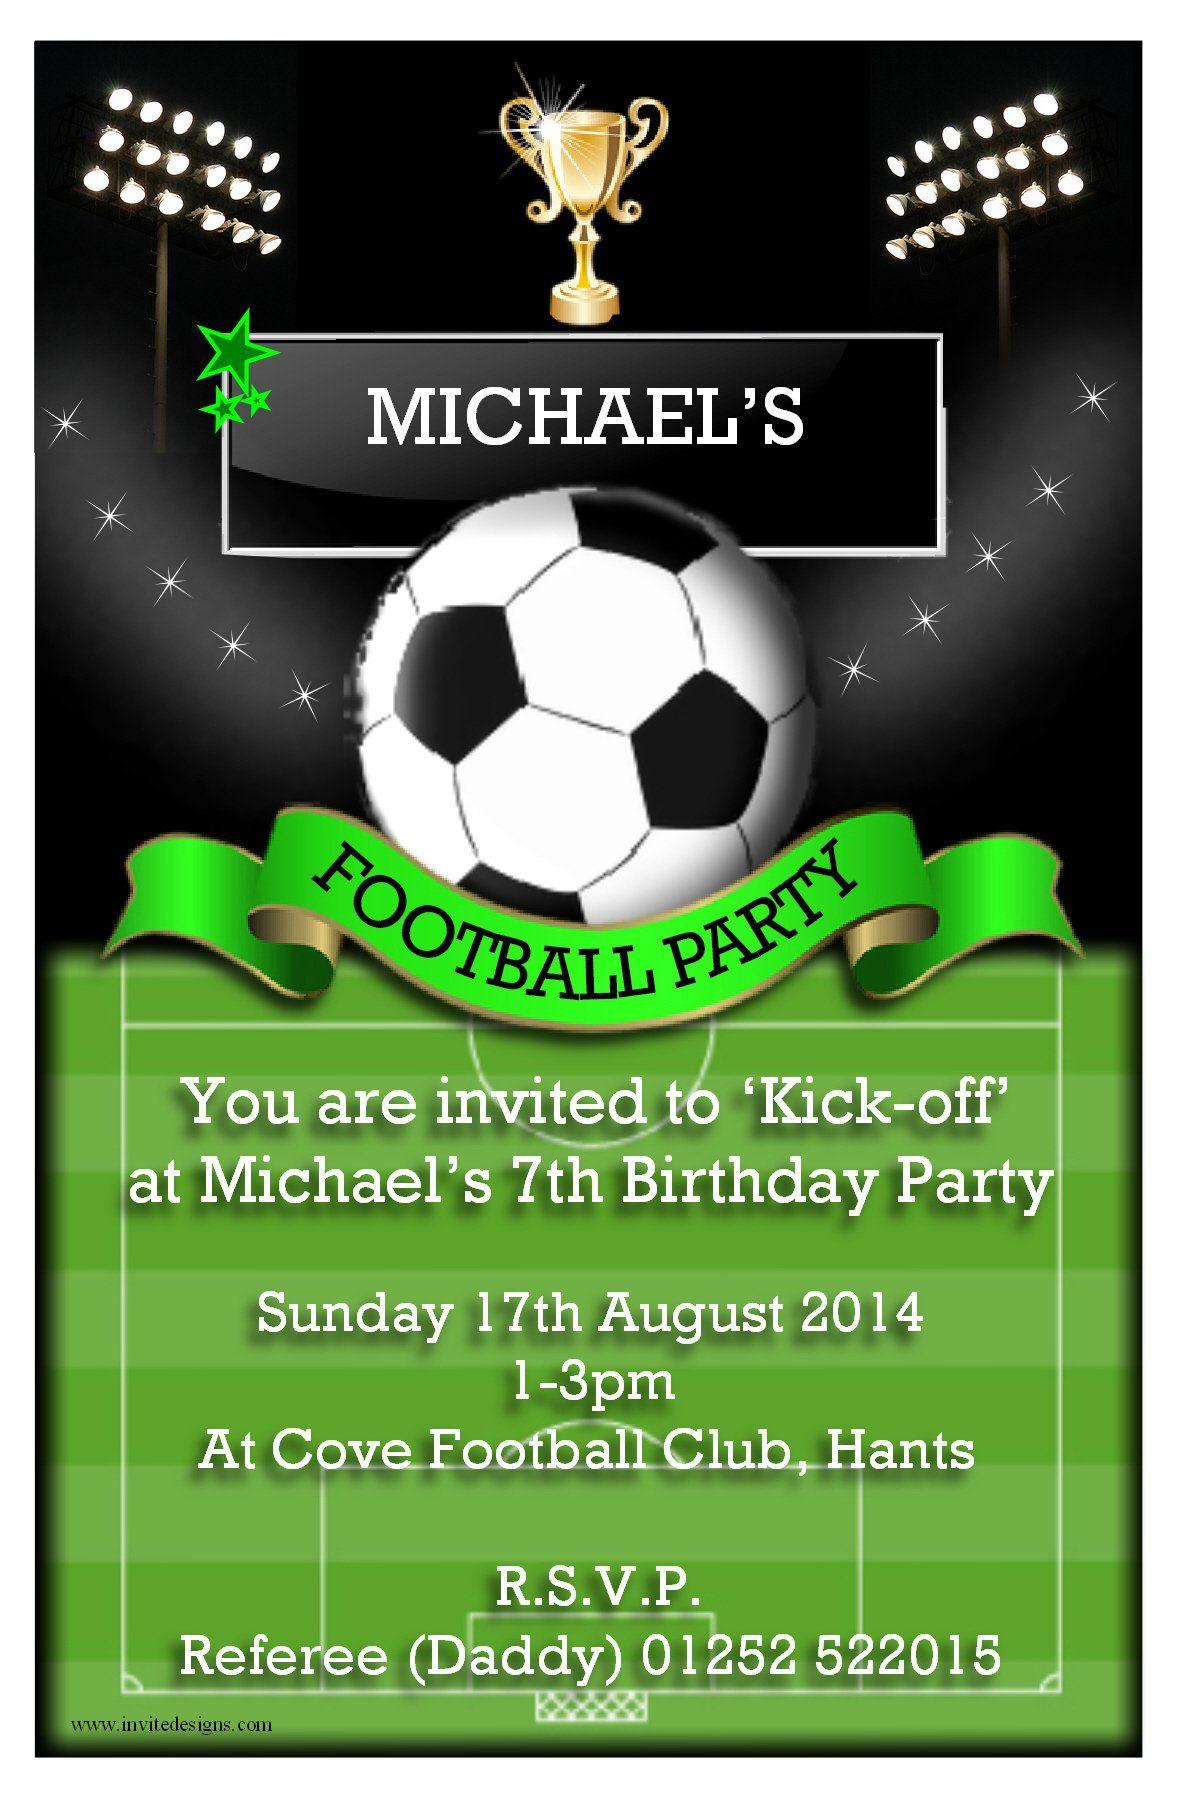 3 Inspiring Free Football Party Invitation Templates Uk Gallery